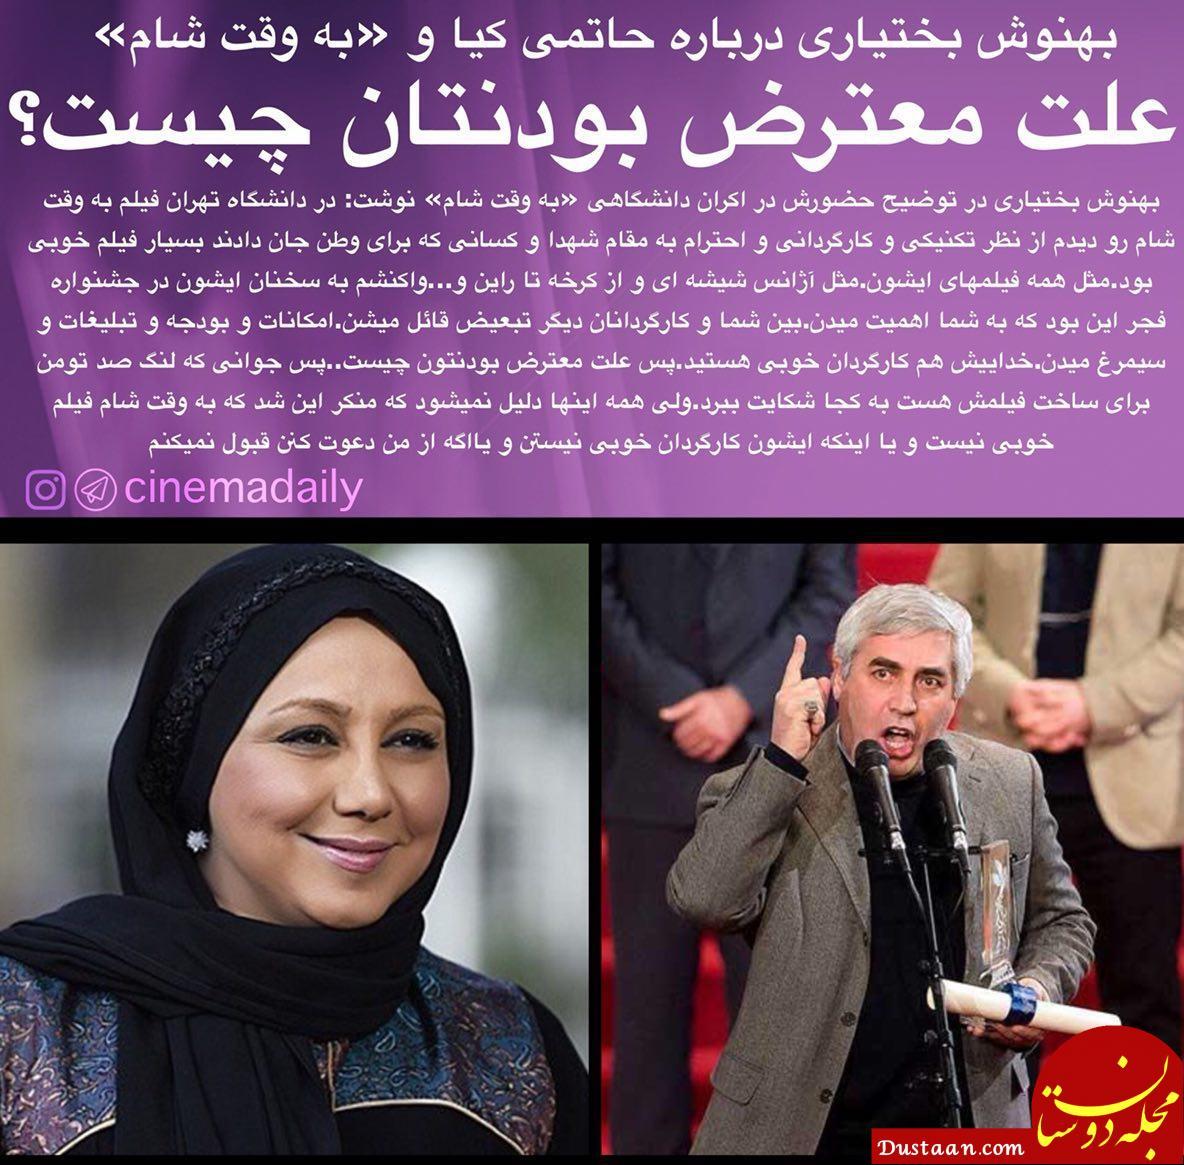 www.dustaan.com بهنوش بختیاری درباره ابراهیم حاتمی کیا: علت معترض بودنتان چیست؟